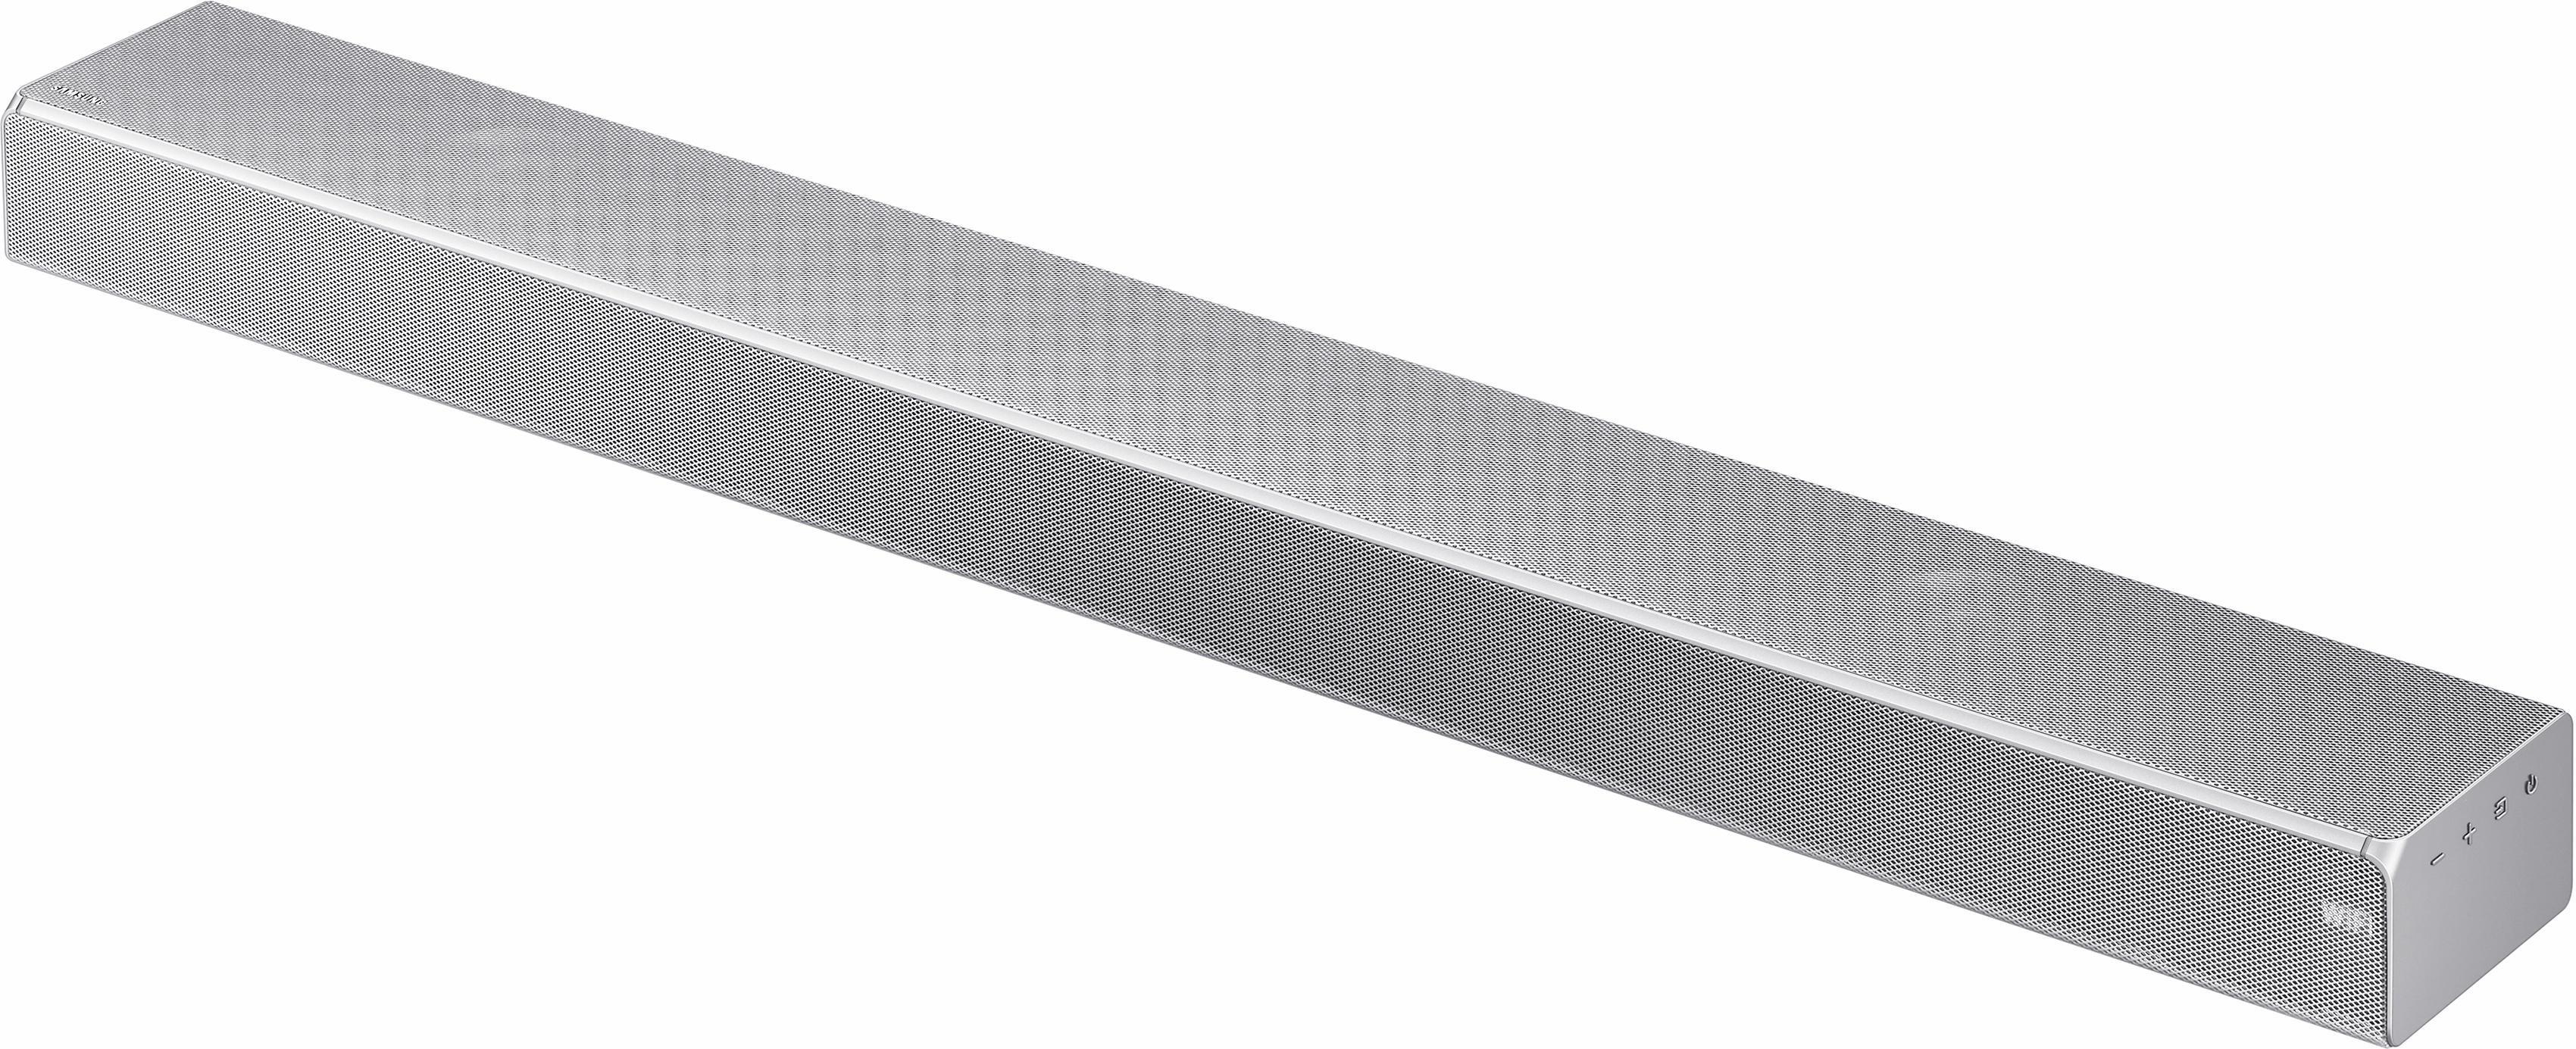 SAMSUNG hW-MS750/751 soundbar (MultiRoom, Bluetooth, wifi) nu online kopen bij OTTO